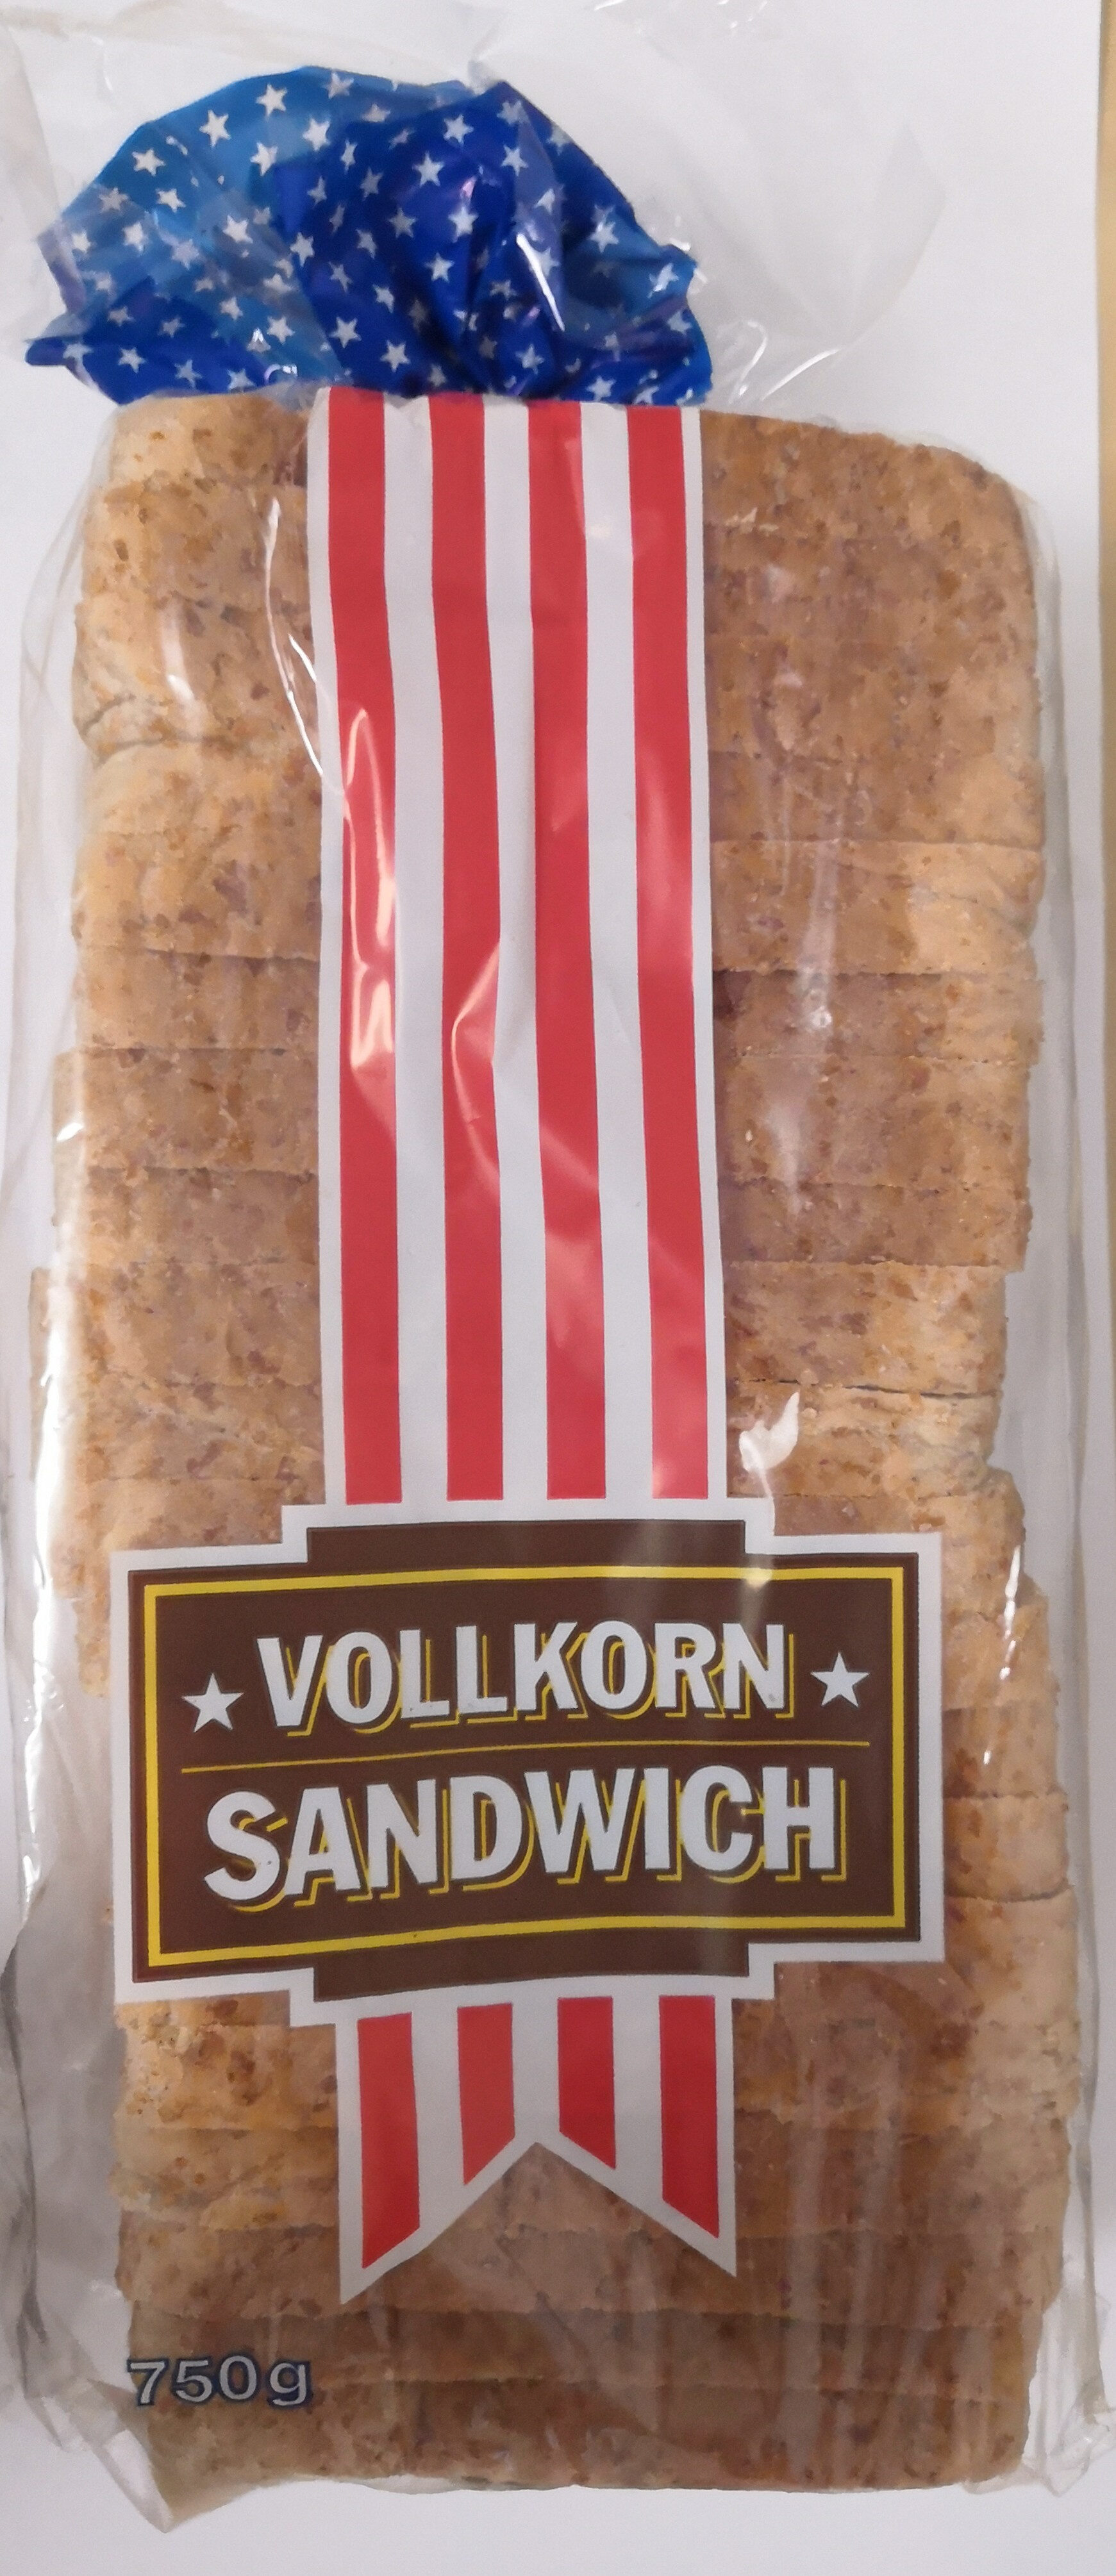 Vollkorn Sandwich - Product